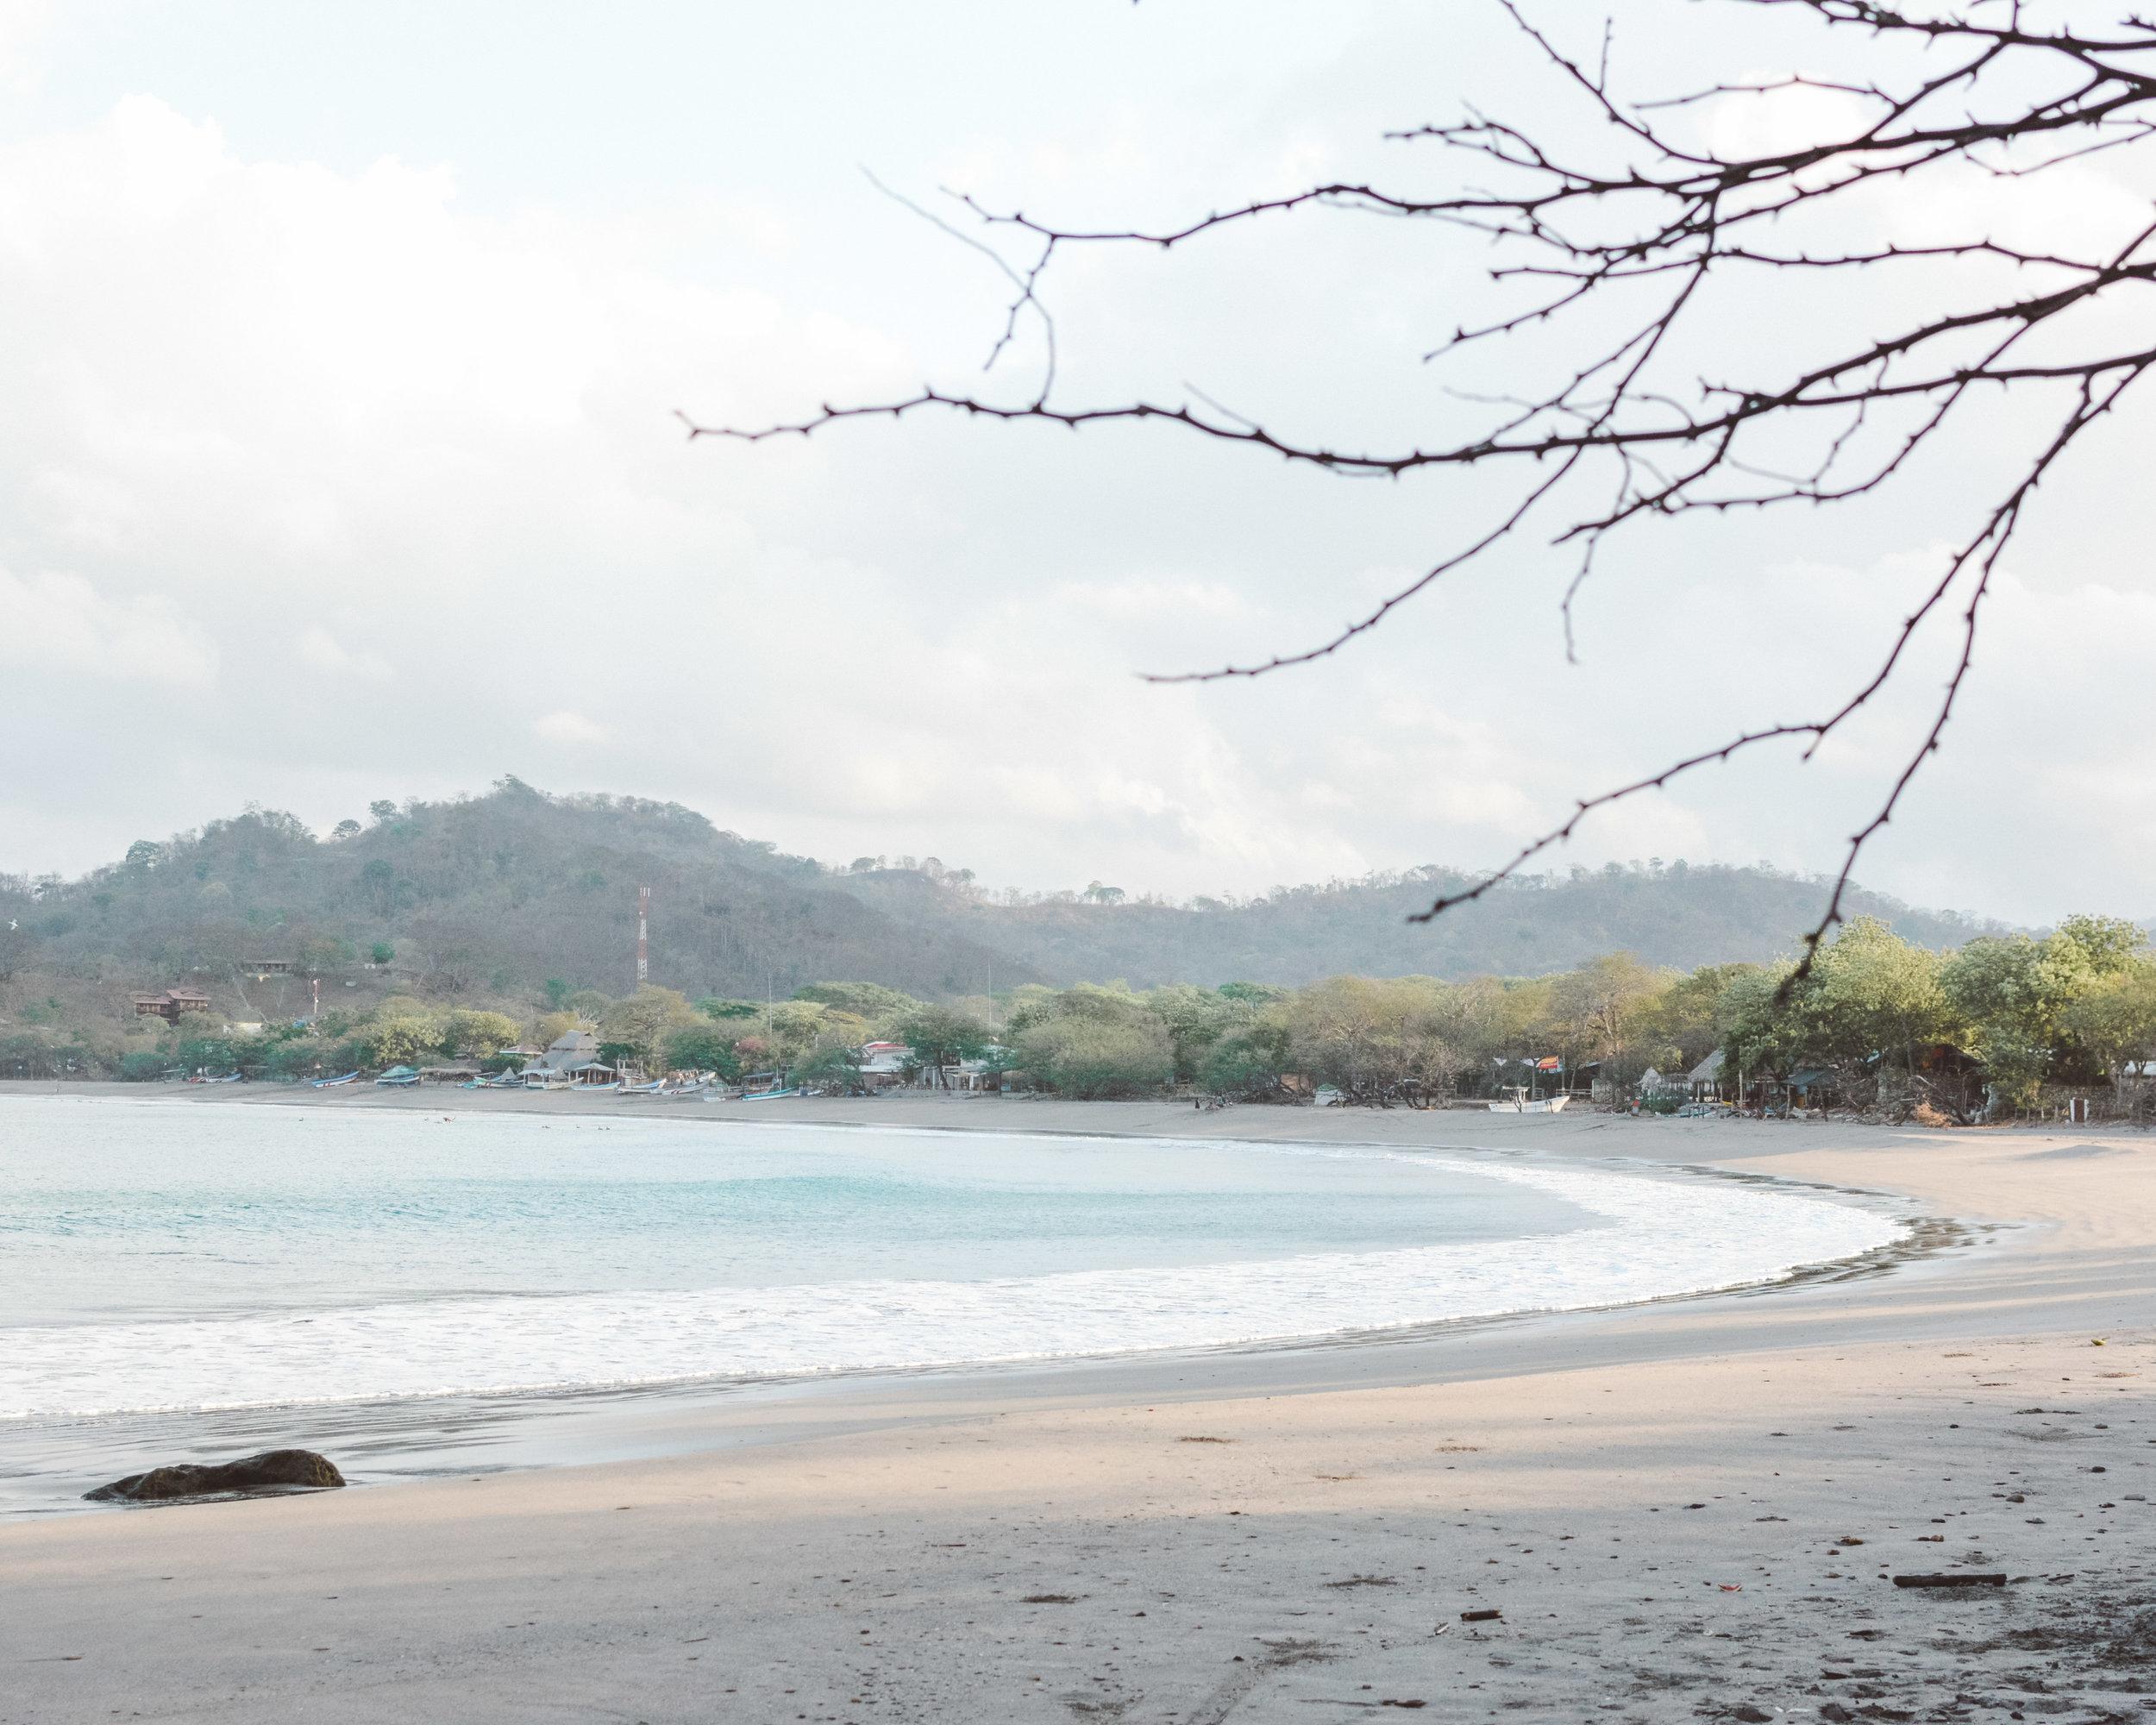 The bay of Gigante, Nicaragua